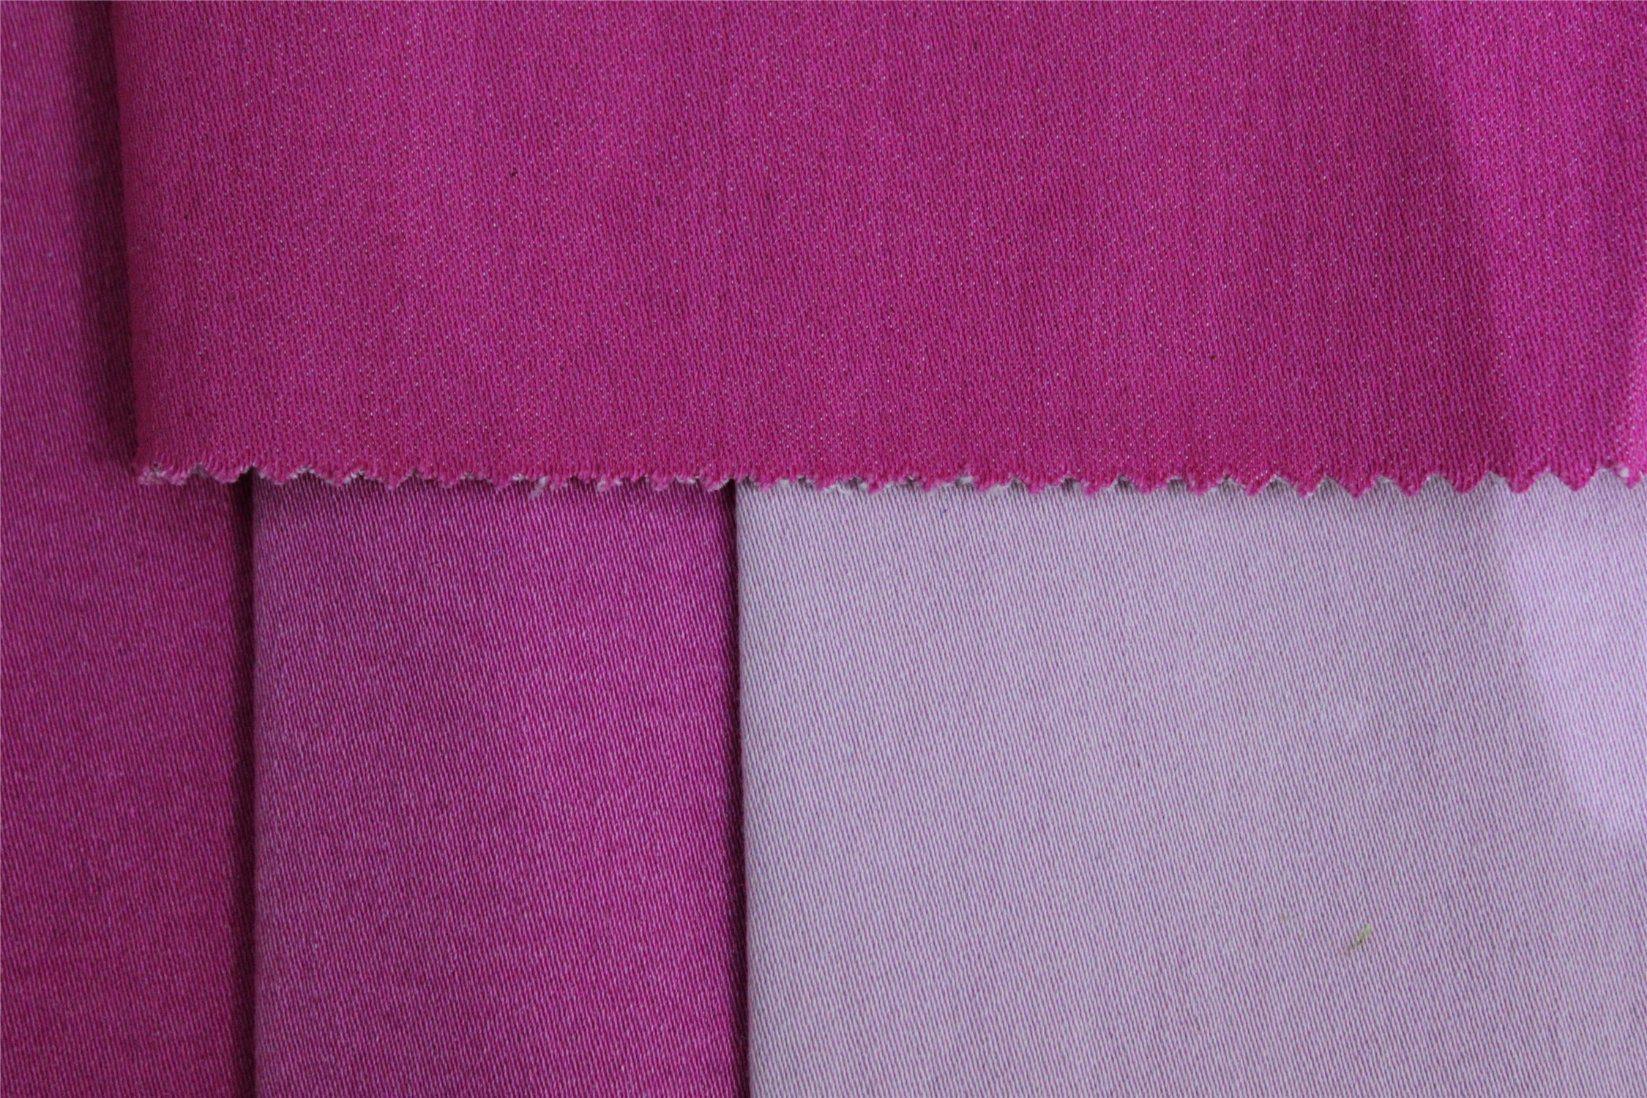 Cotton Polyester Spandex Color Denim